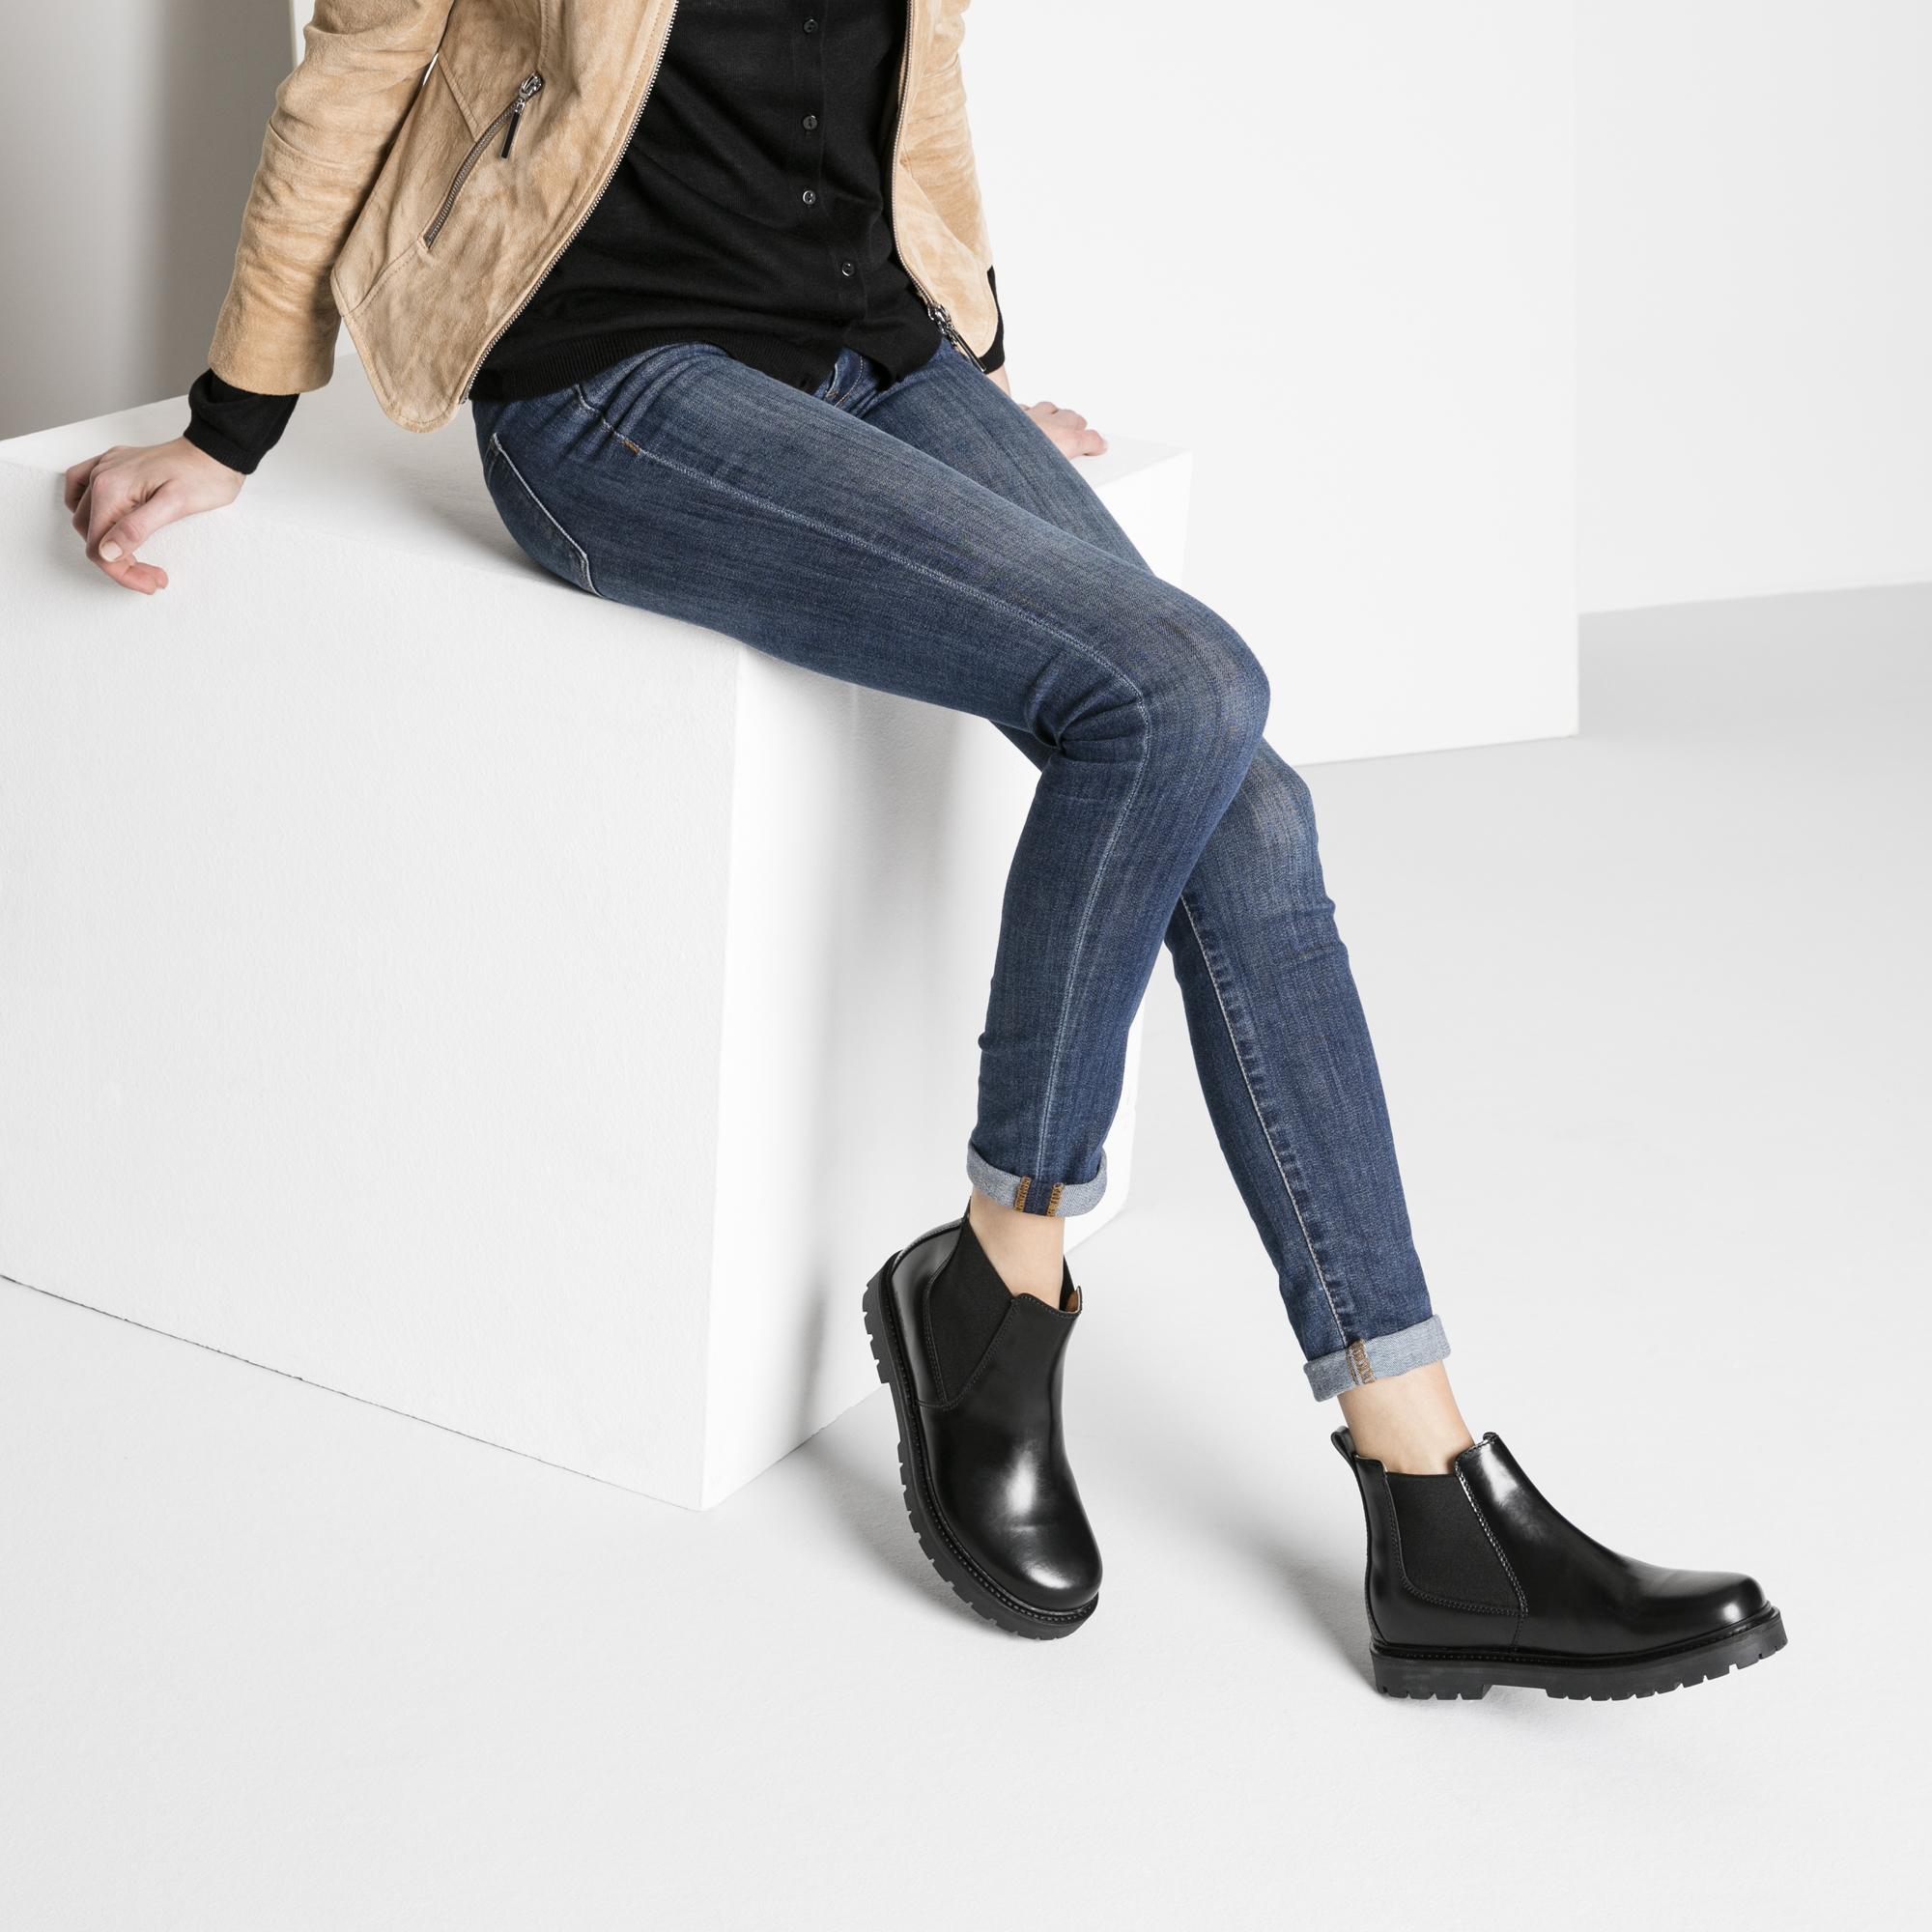 Stalon Natural Leather Schwarz